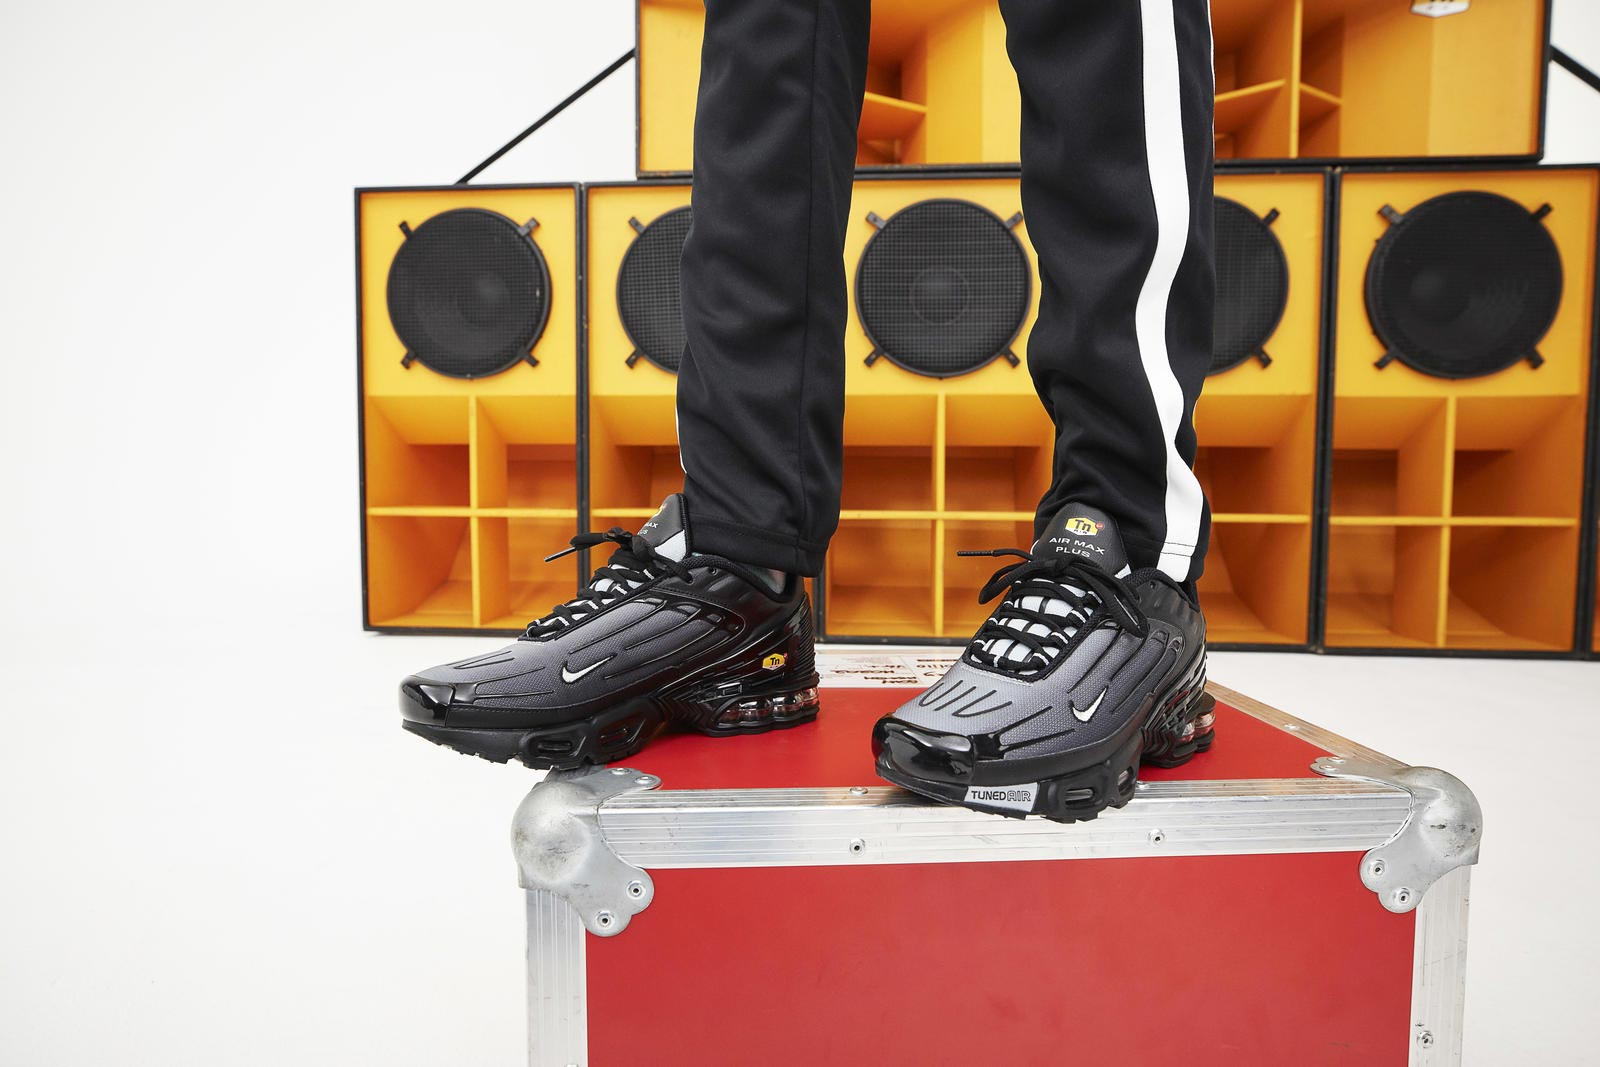 Preview: Nike Air Max Plus 3 TN3 Black Grey - Sergioabranches